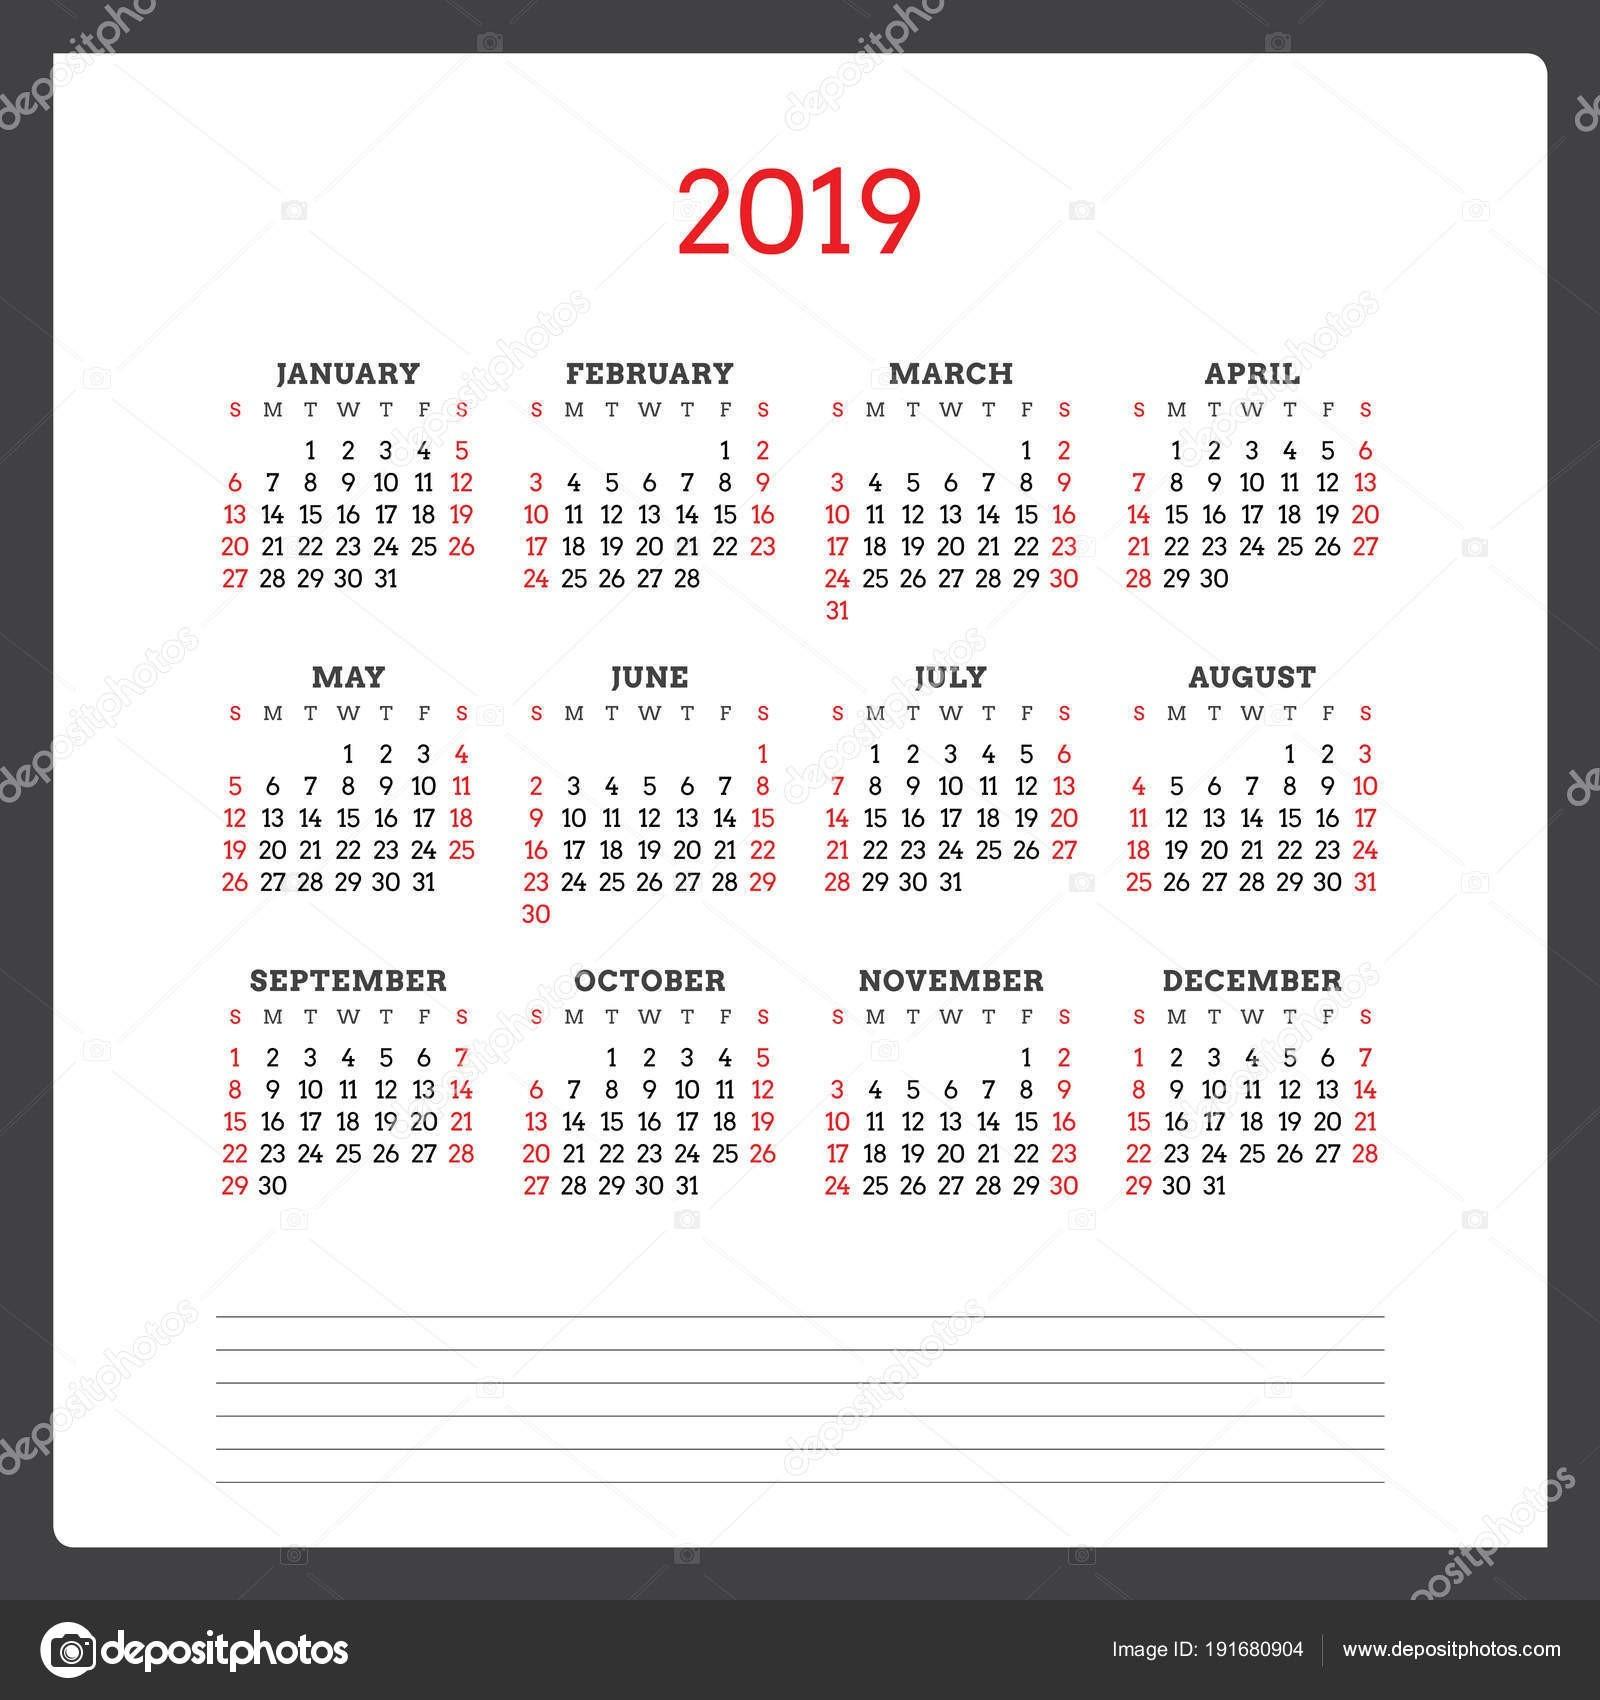 Noticias Calendario 2019 Para Imprimir Con Feriados Mexico